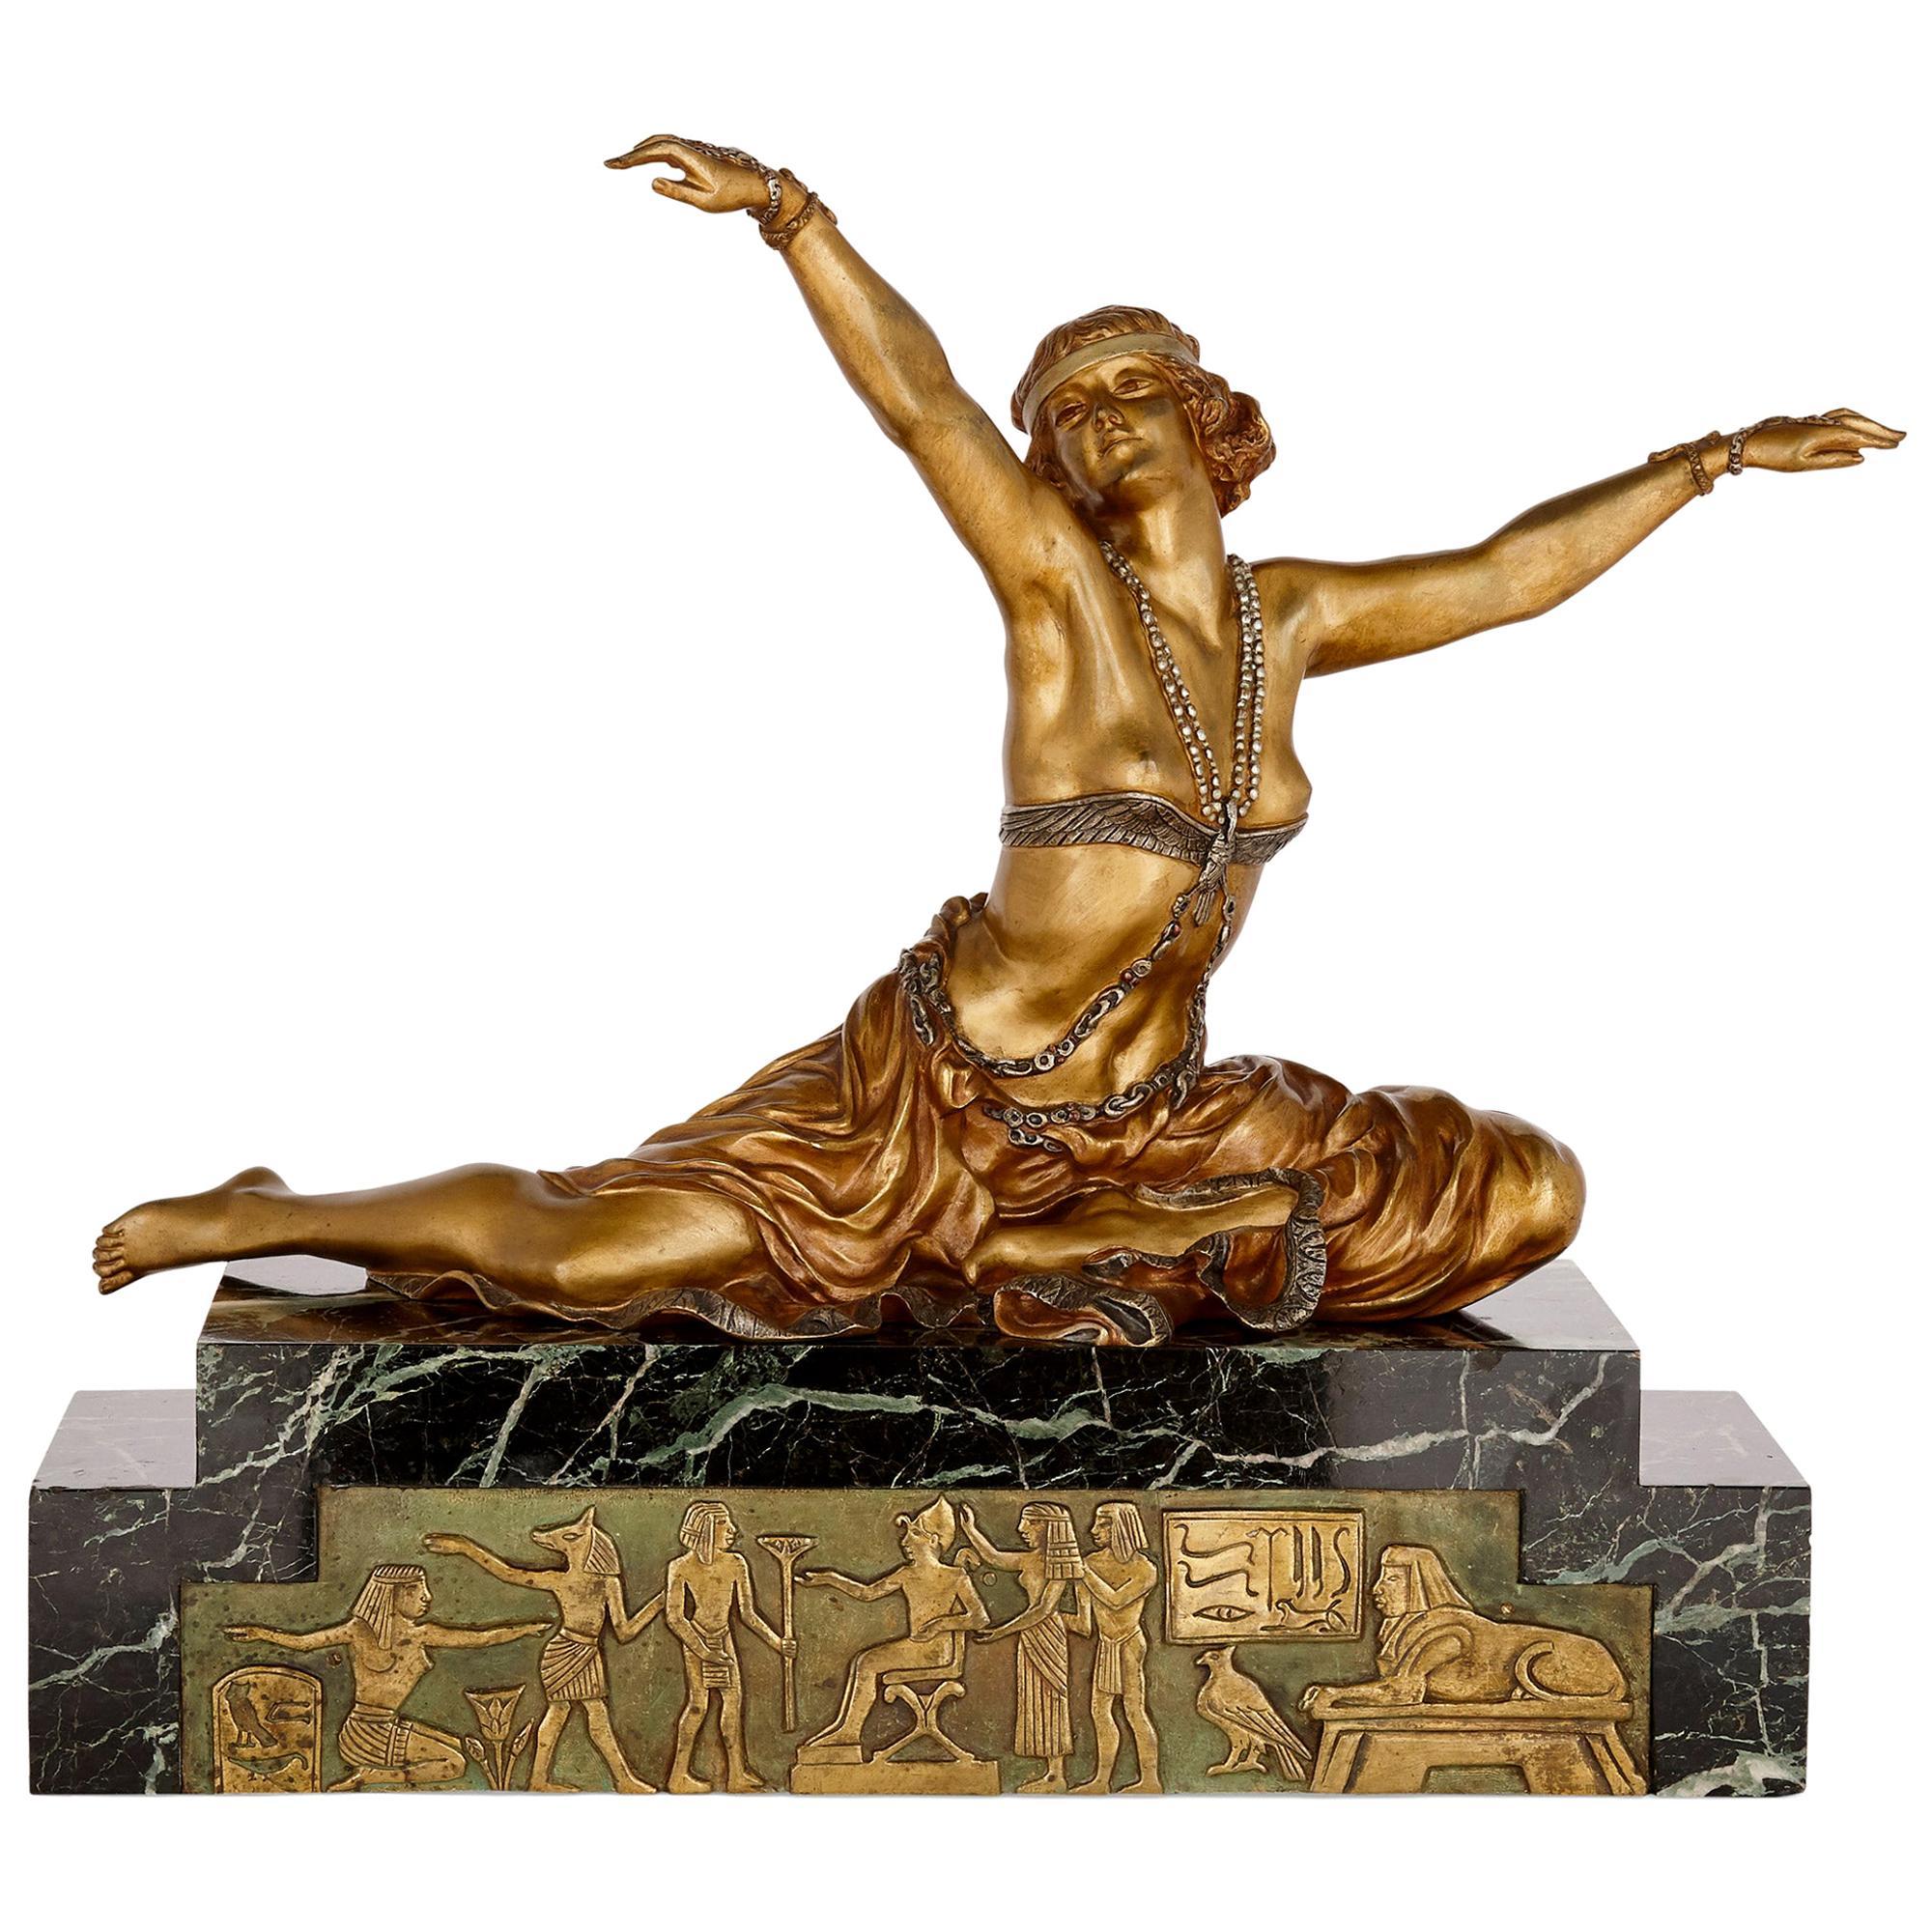 Art Deco Gilt Bronze Sculpture of the 'Theban Dancer' by CJR Colinet